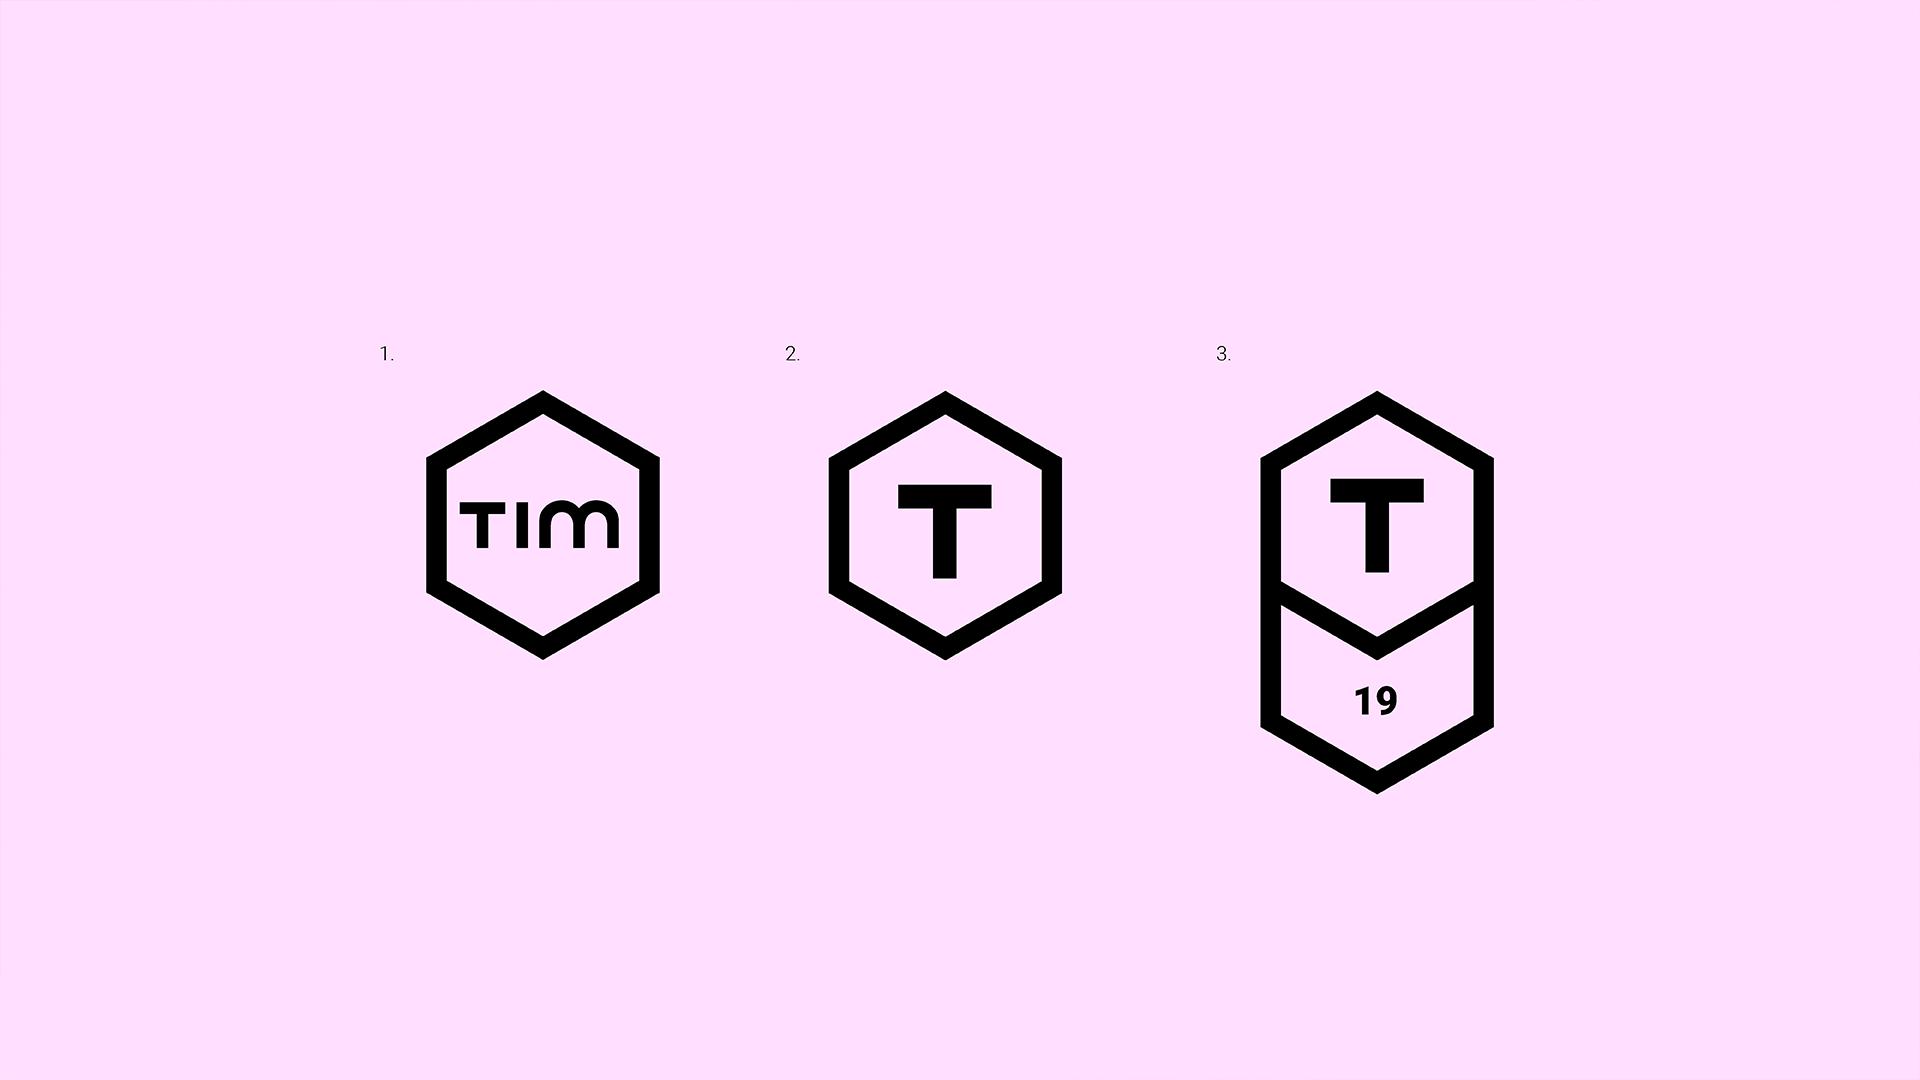 Tim_insigniamore